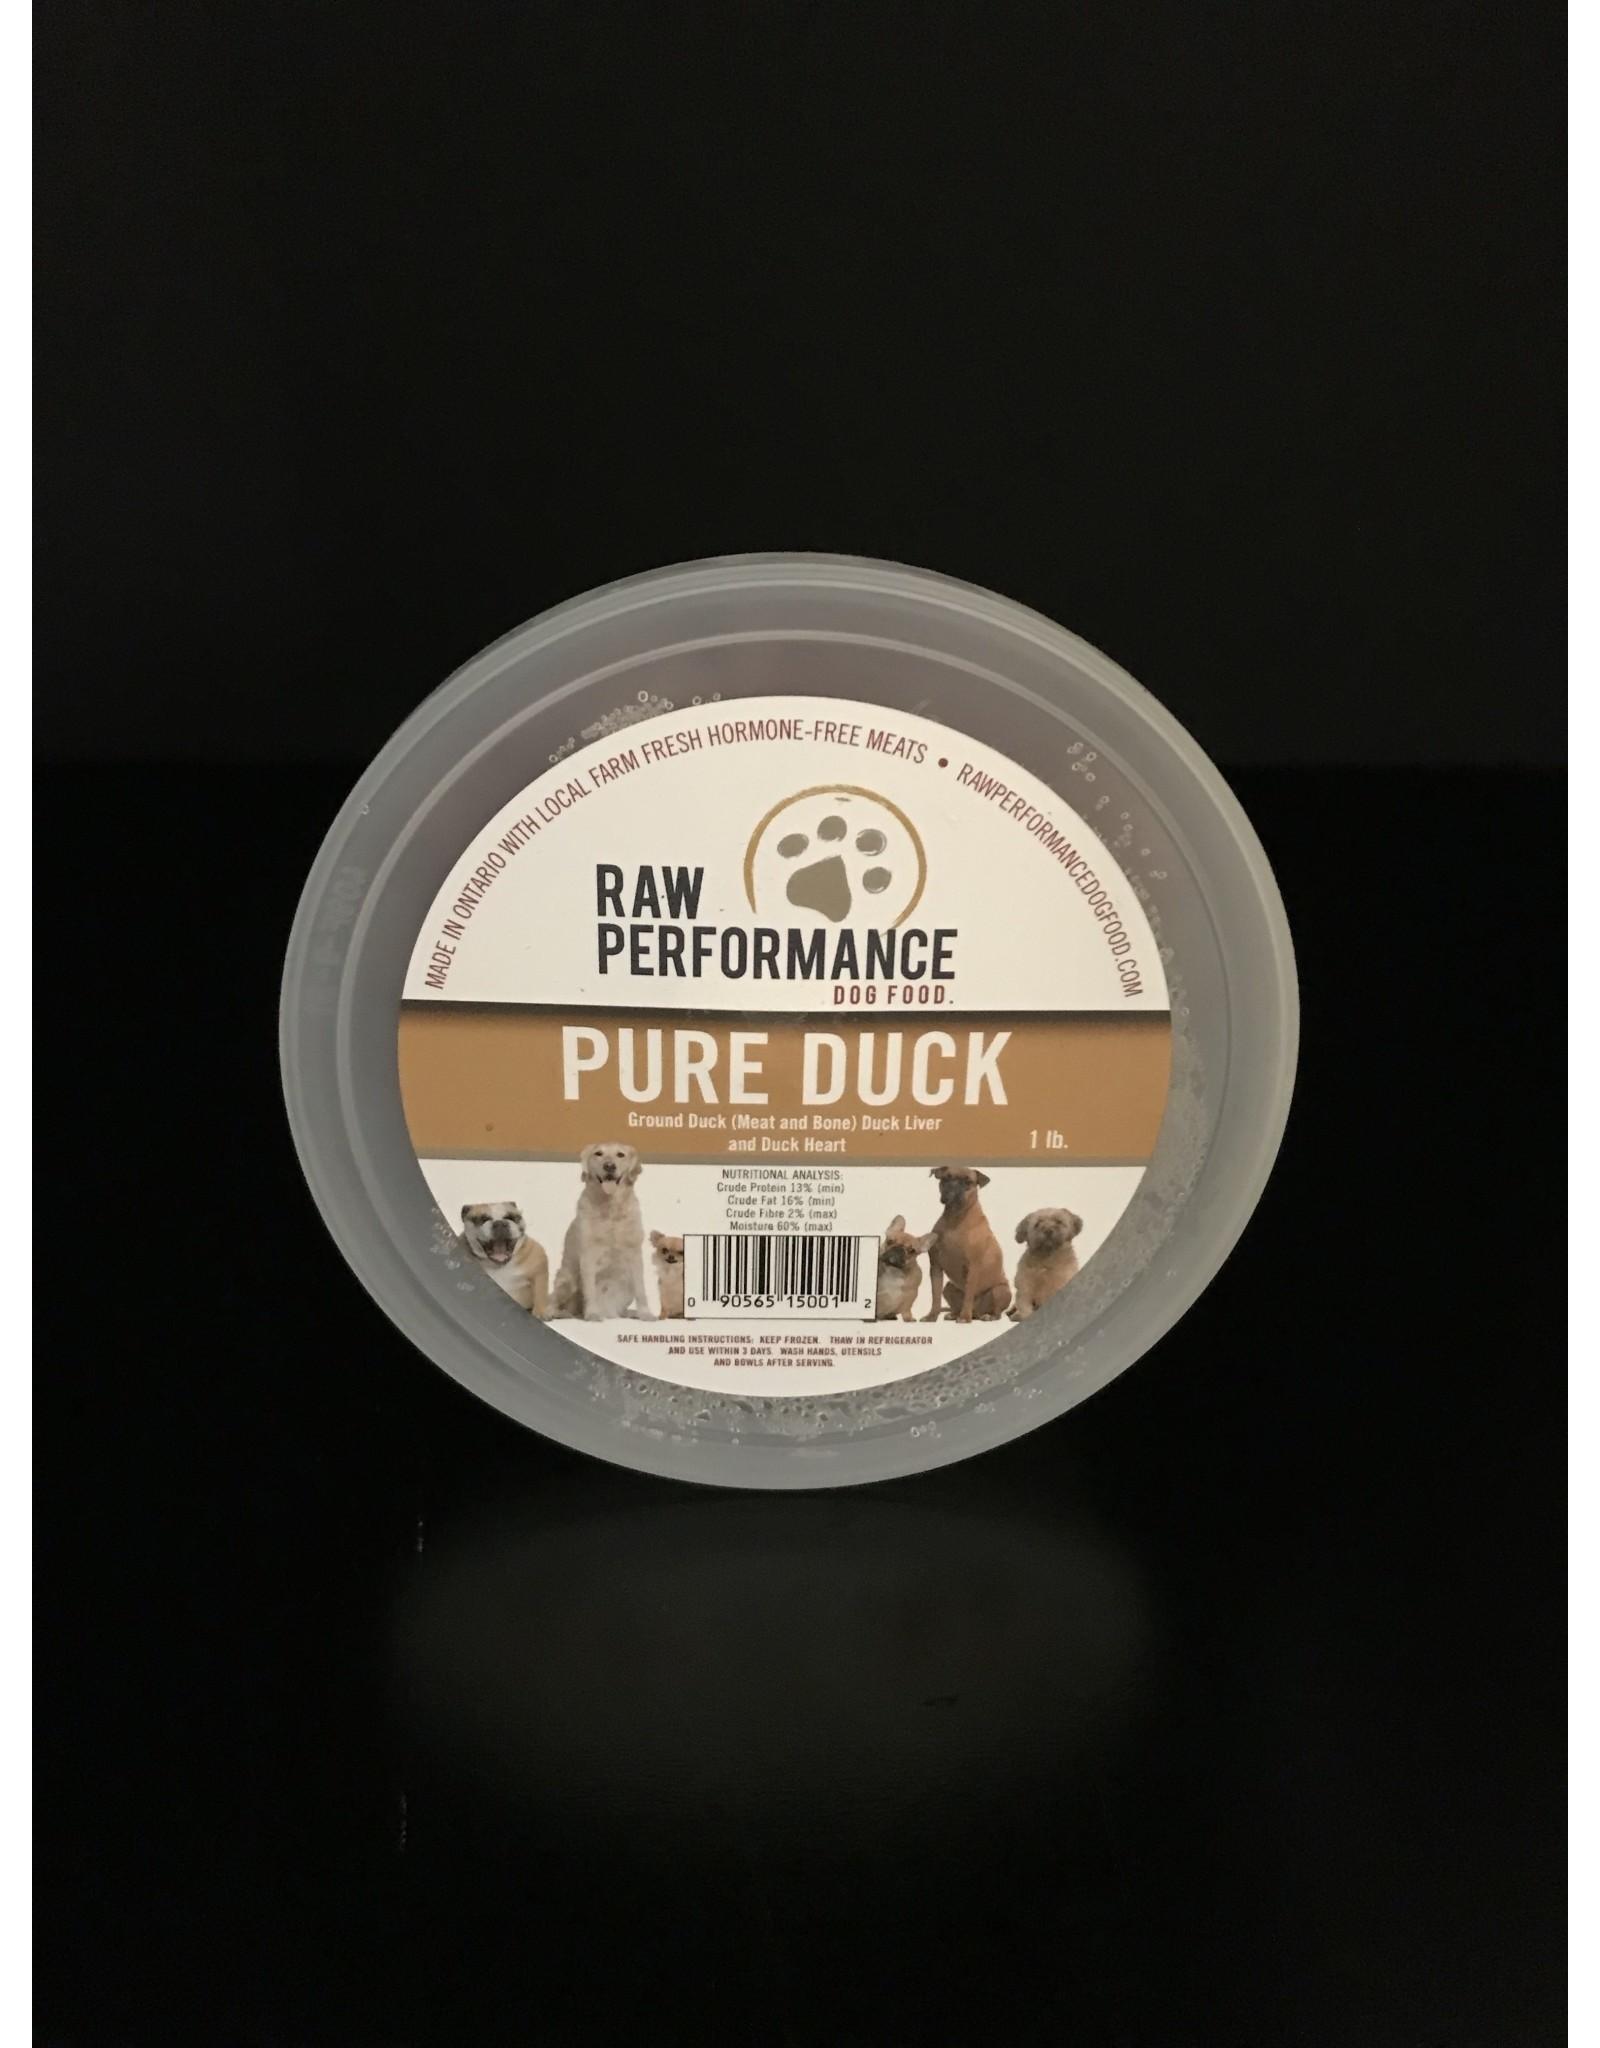 Raw Performance Raw Performance - Pure Duck - 1LB